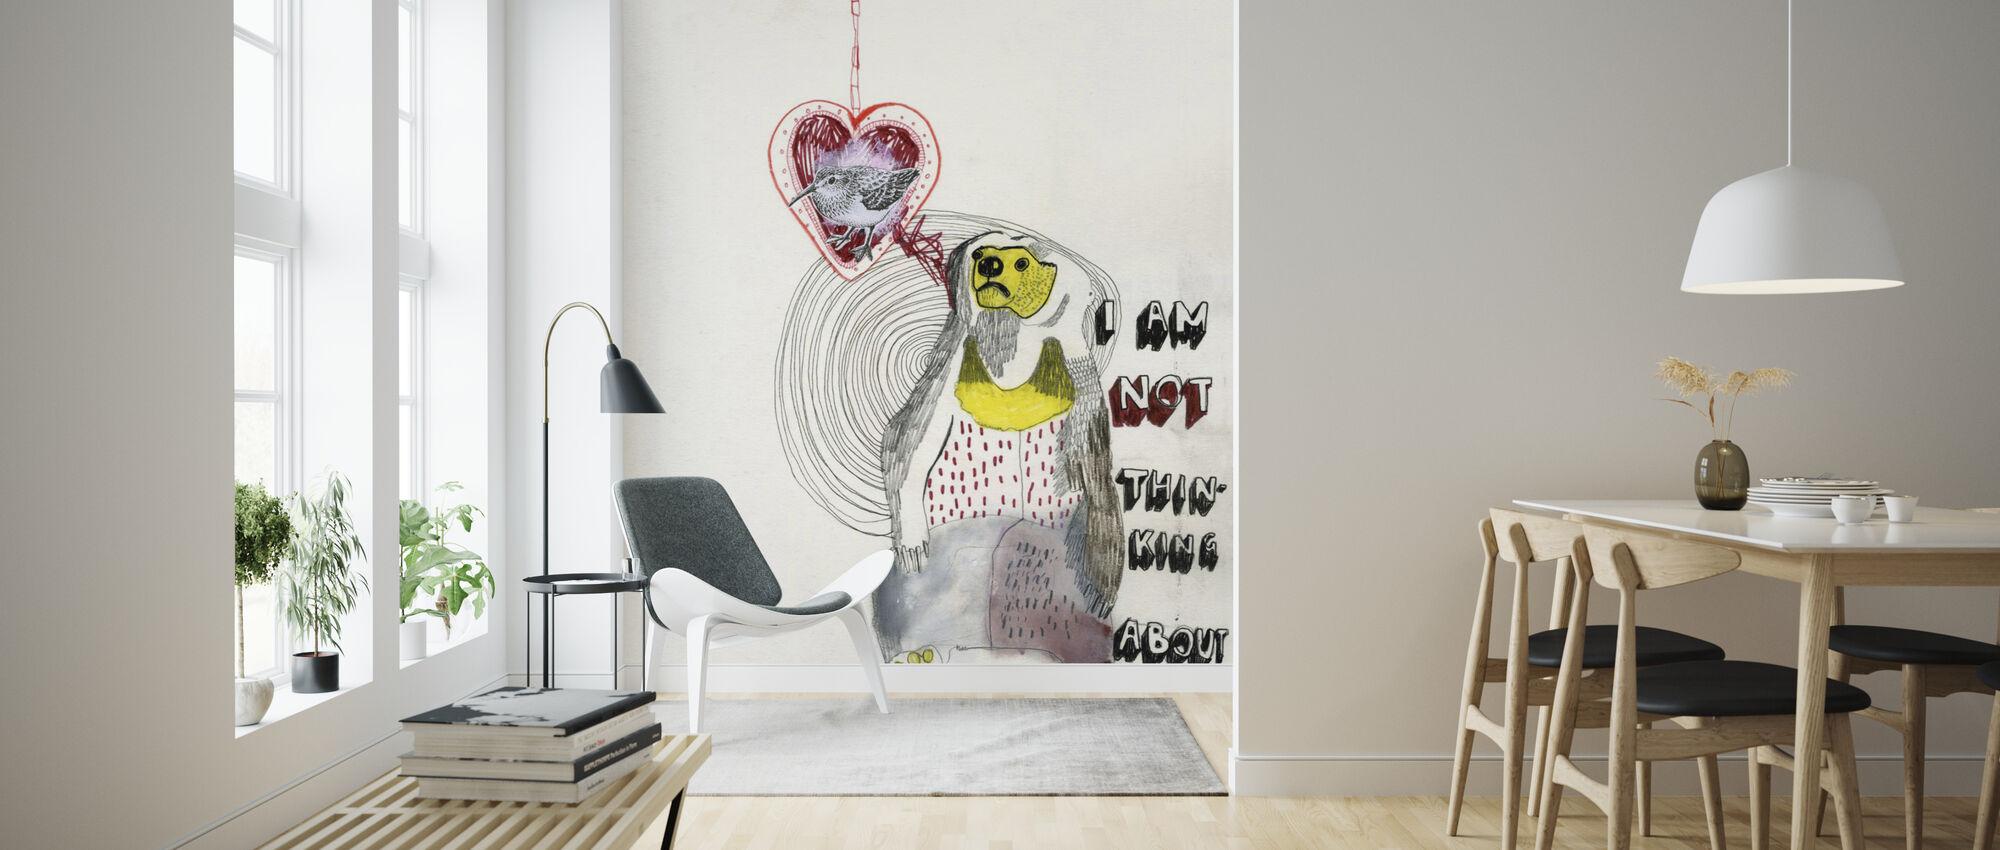 Bear - Wallpaper - Living Room